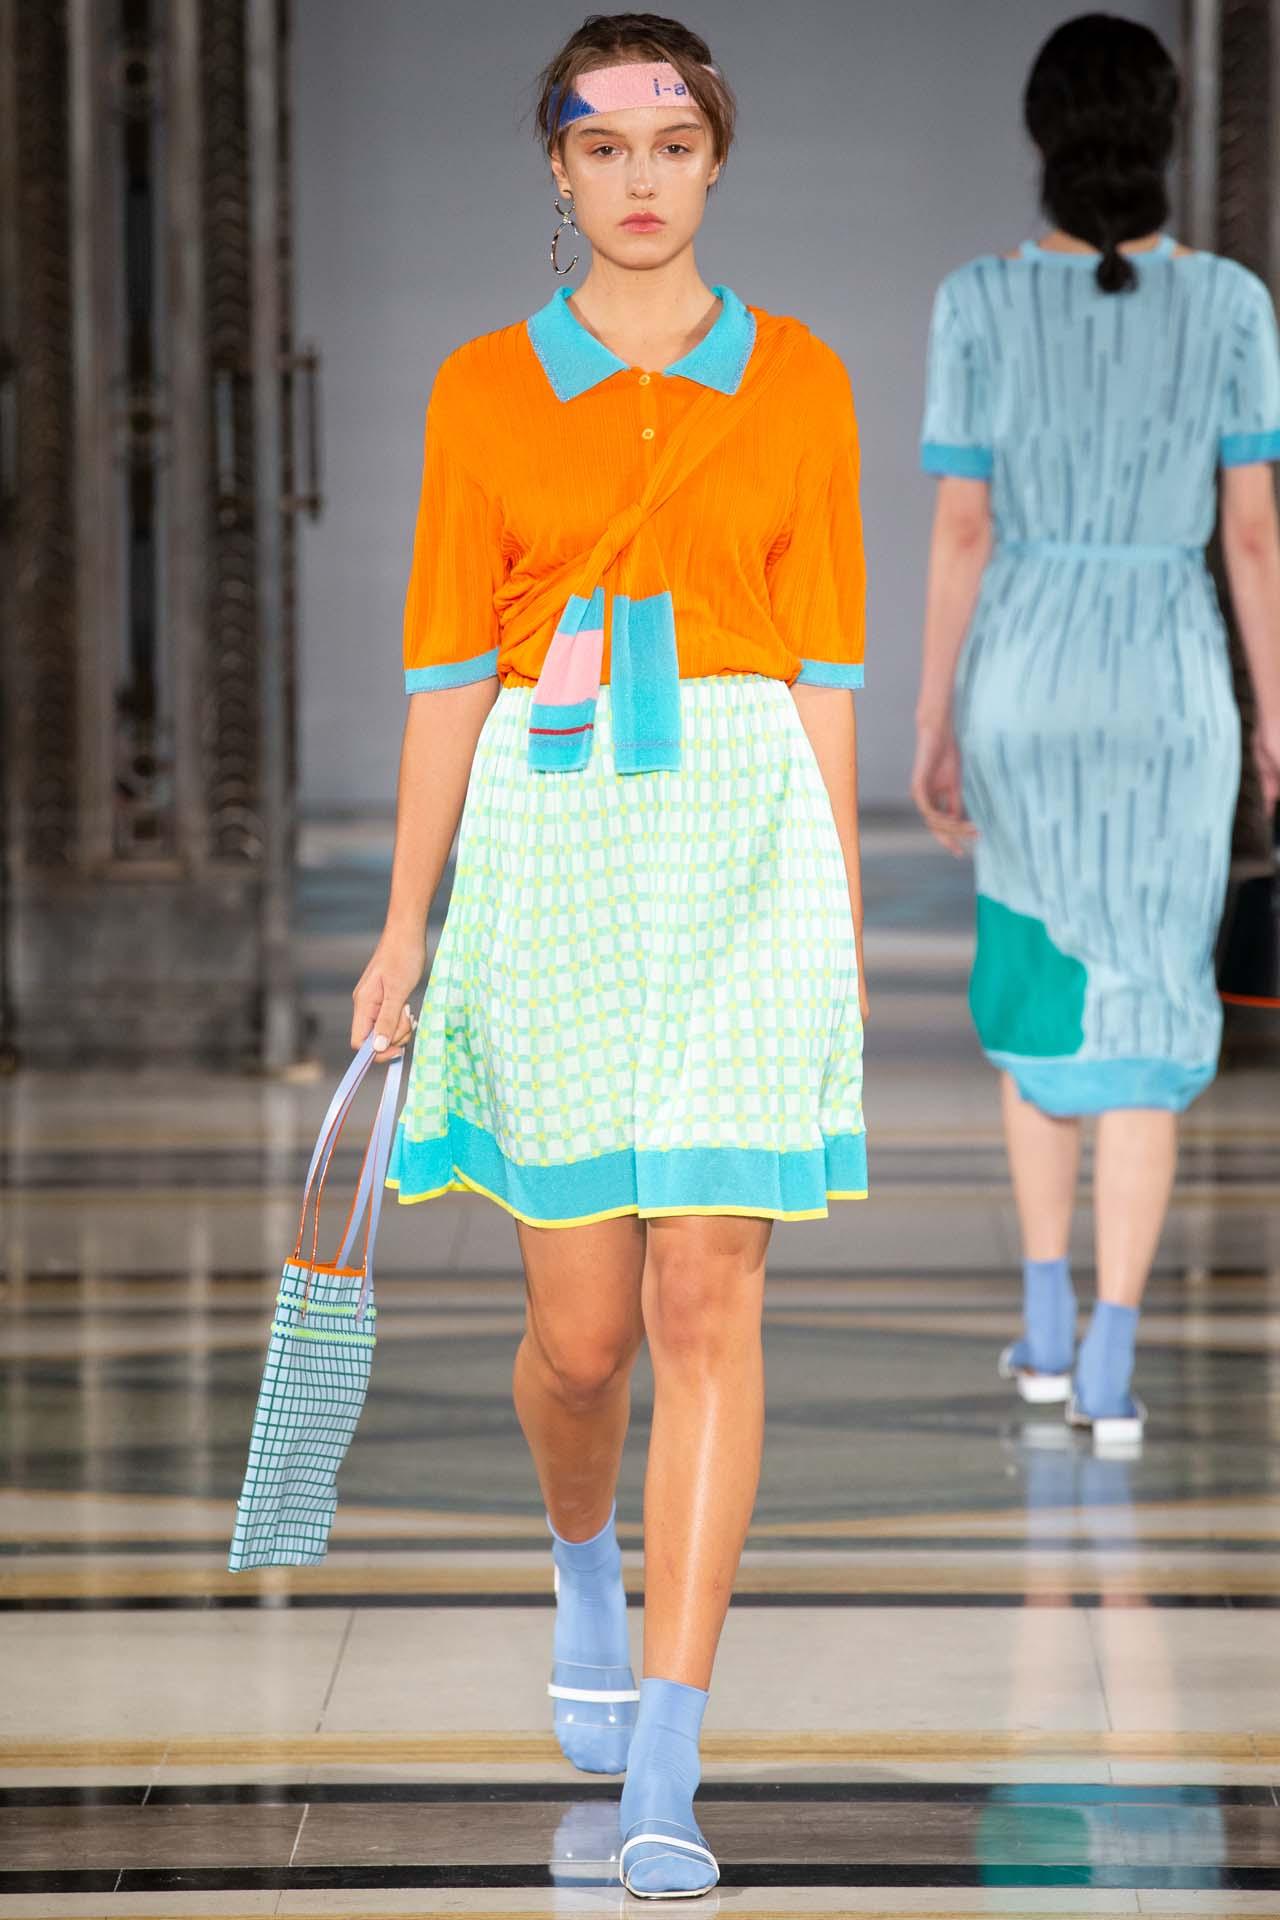 Fashion scout merit award winner i am chen (4)